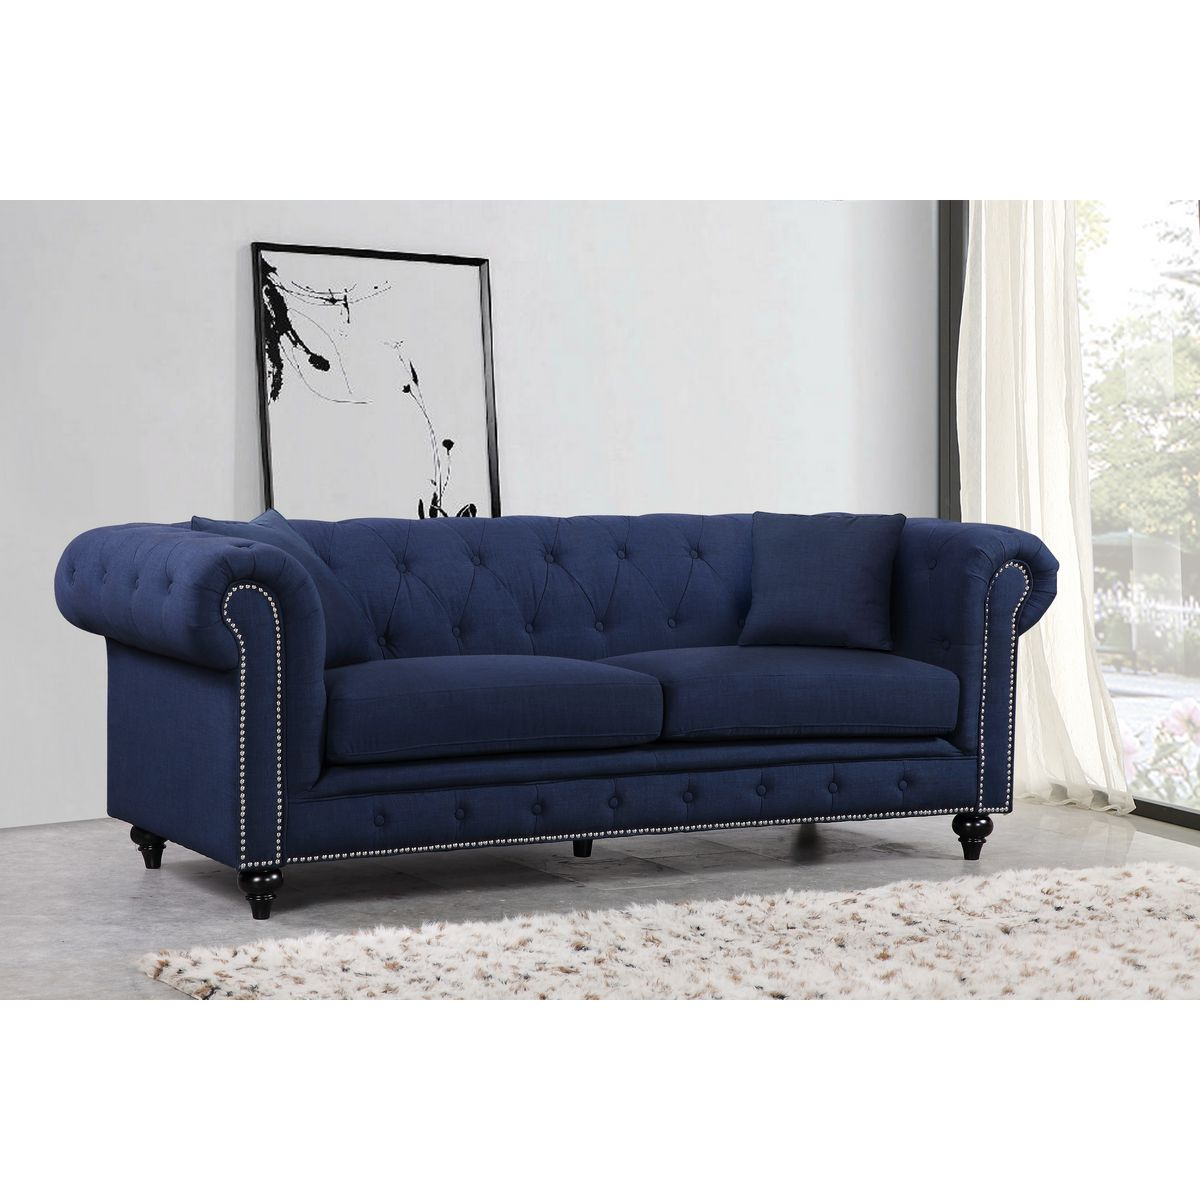 Chesterfield Tufted Navy Linen Sofa w/ Silver Nailhead Detail #dynamichome #blue #tufted #fabric #sofa #chesterfield #nailhead #traditional #style #homedecor #inetriors #interiorsdesign #livingroom #greatroom #linen #navy #color #inspo